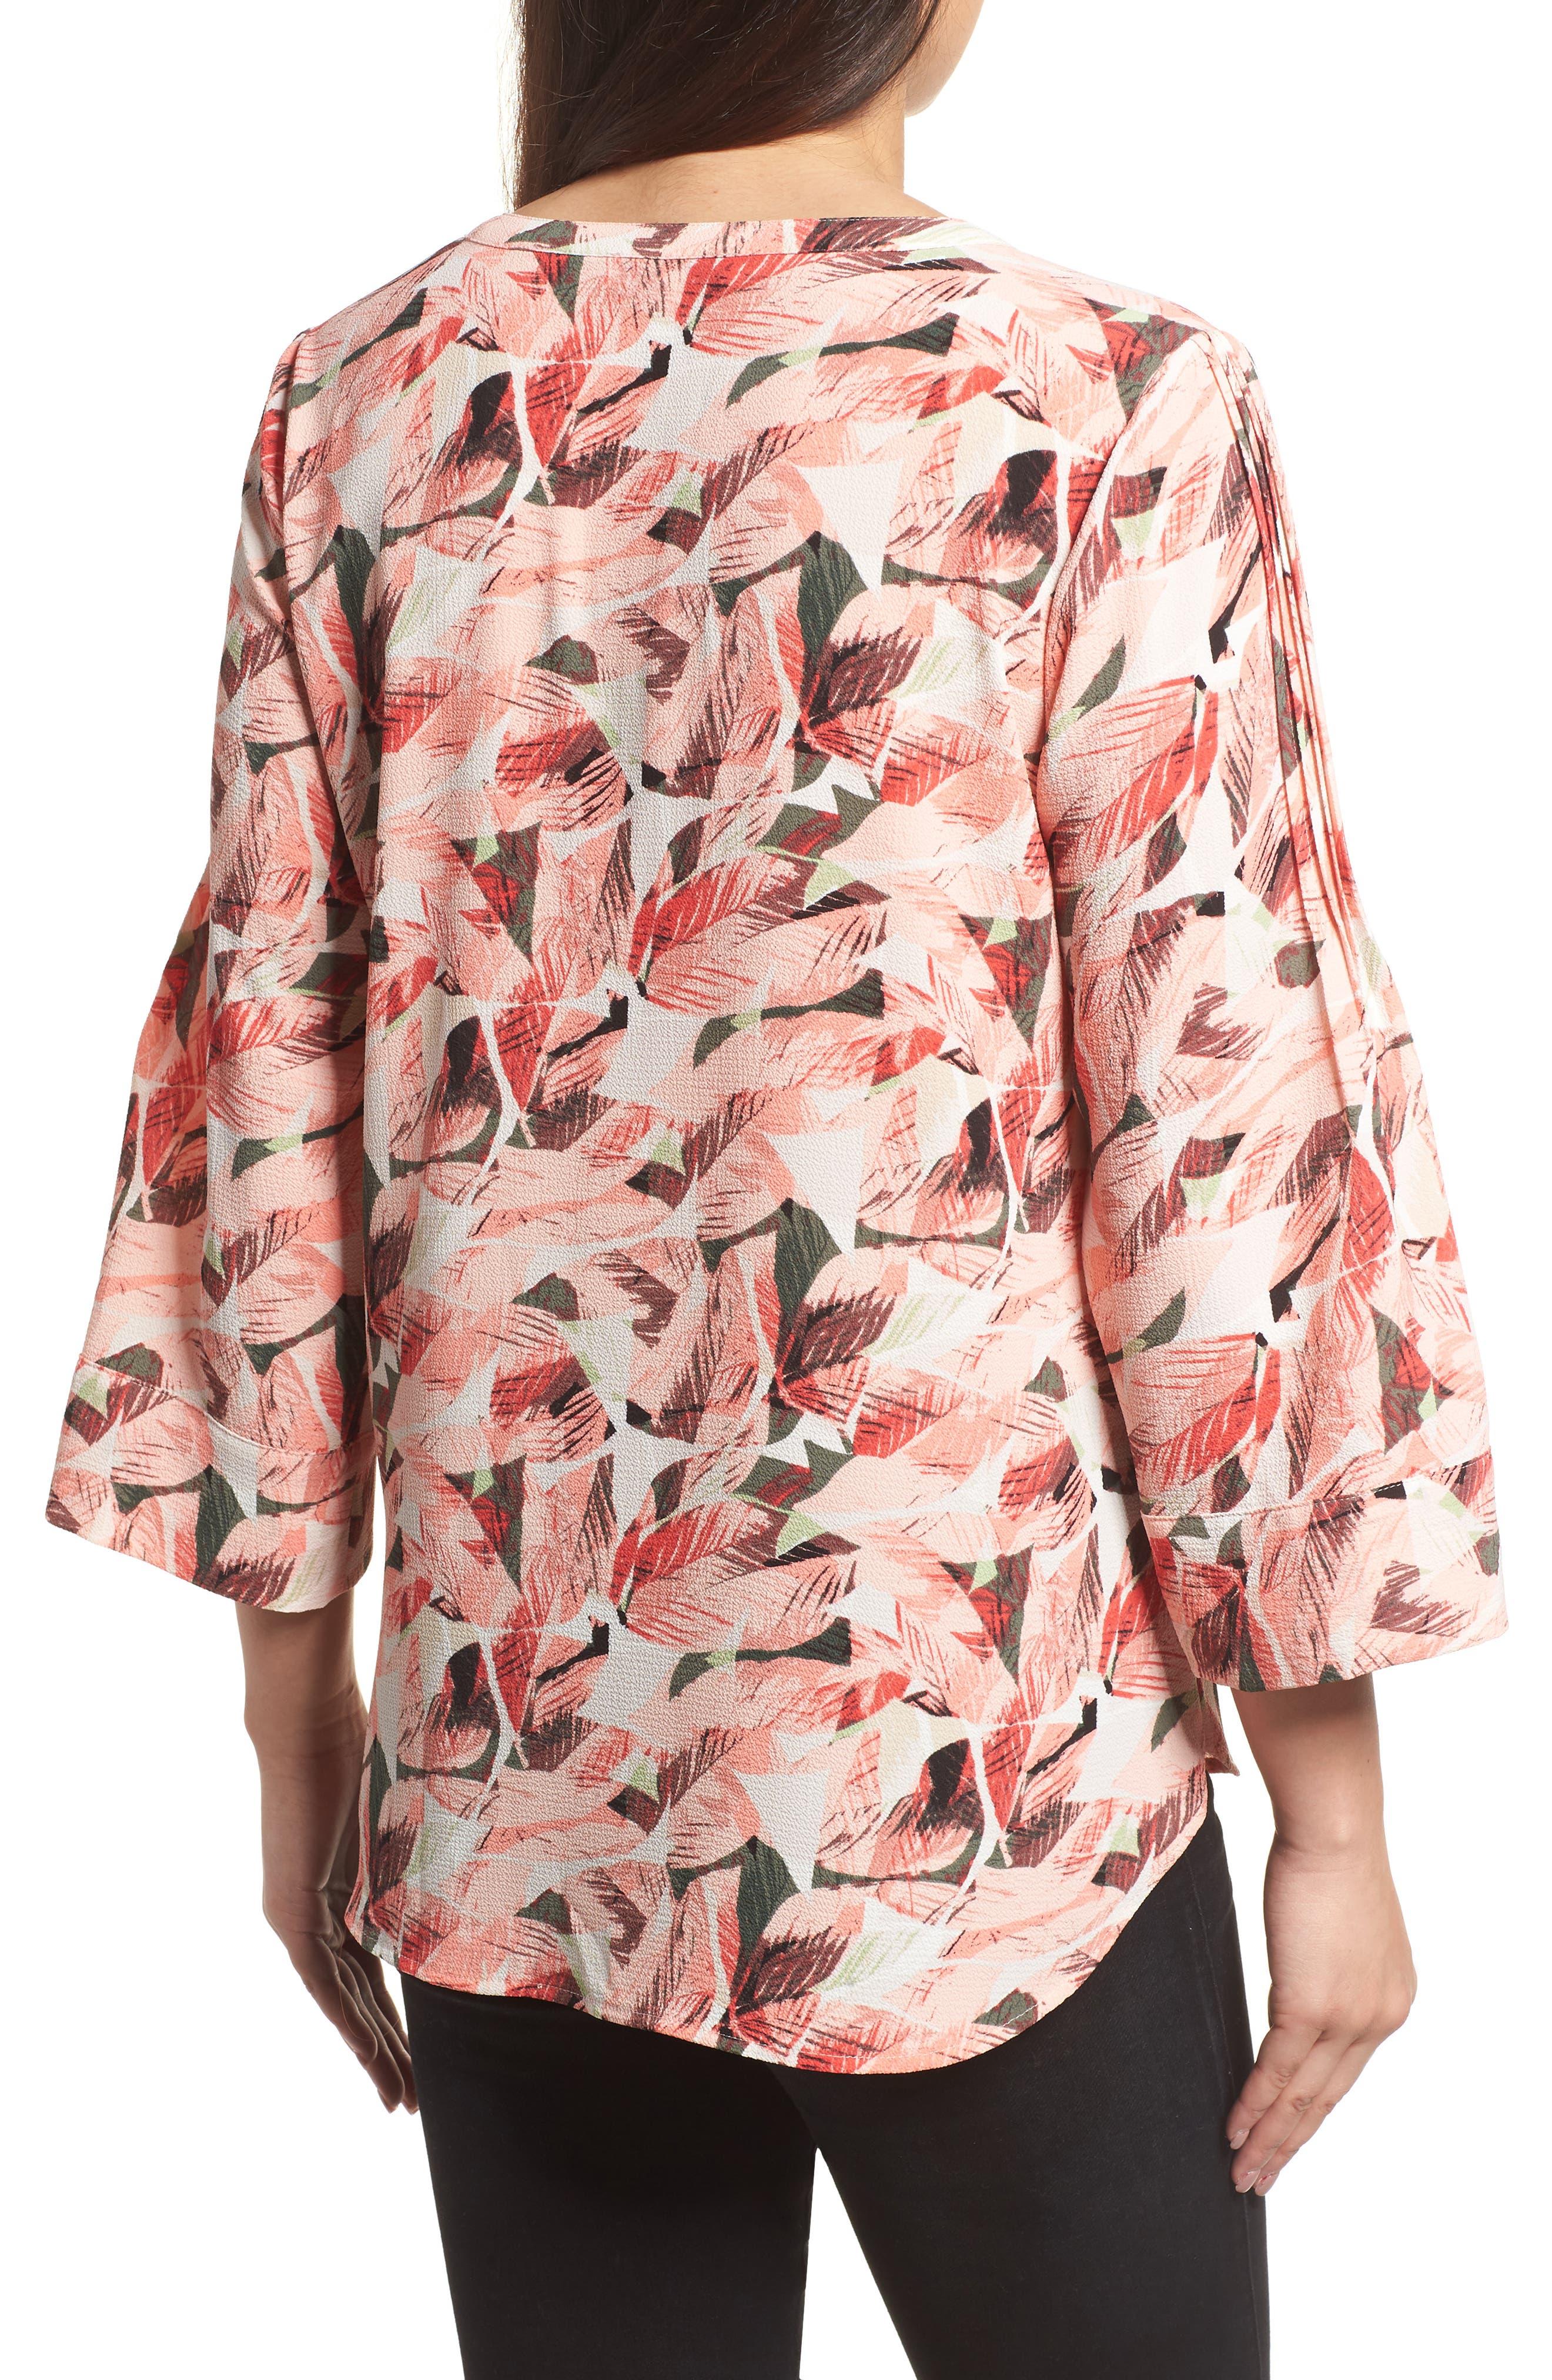 Tropical Print Pleated Sleeve Top,                             Alternate thumbnail 2, color,                             867-Sunrisepeach